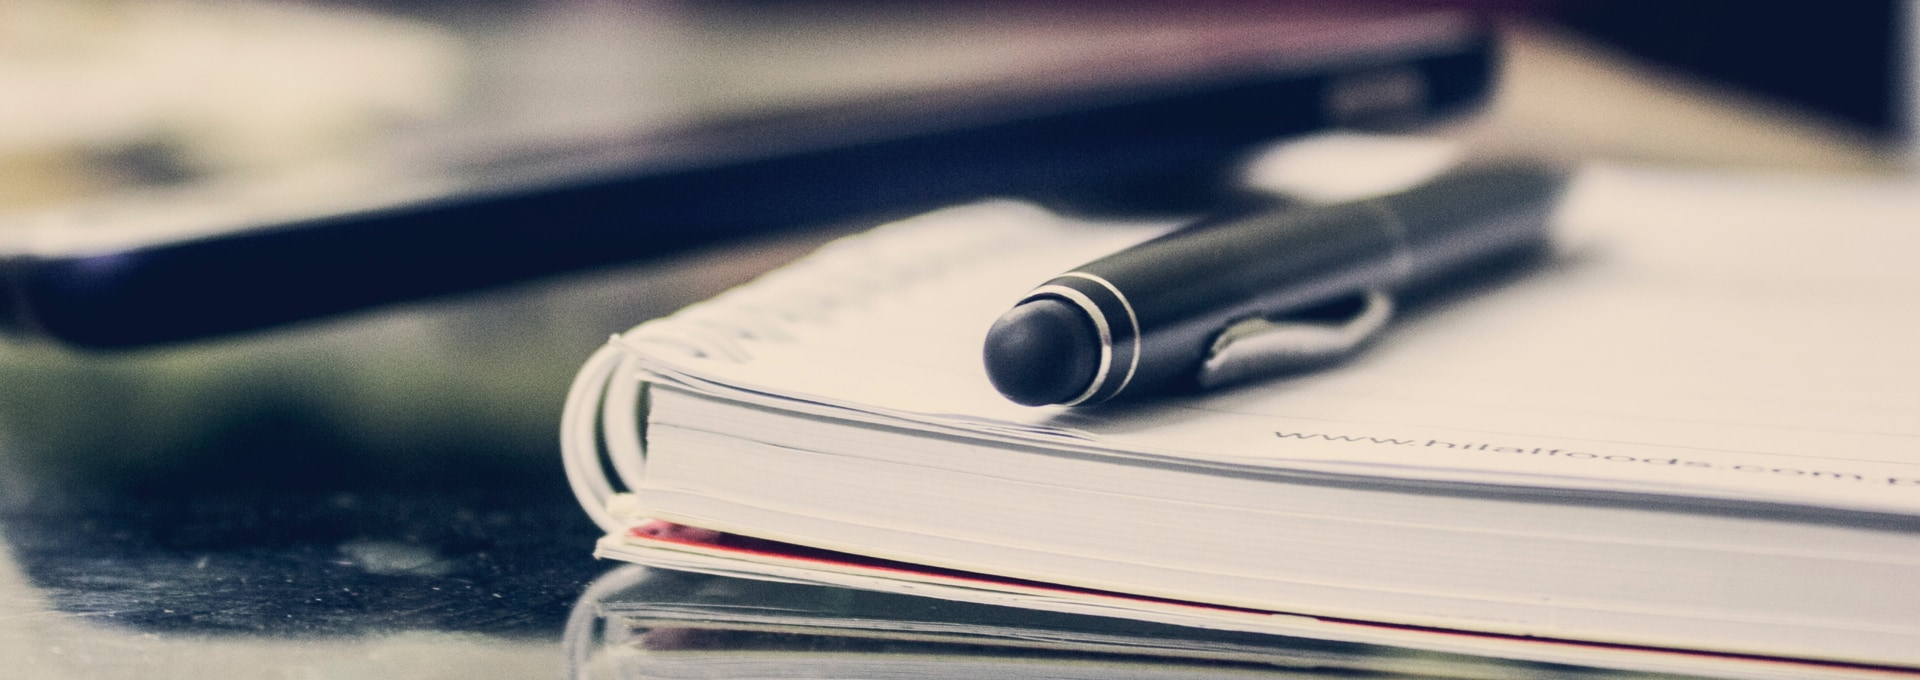 Stephenson Smart: Tax Investigations